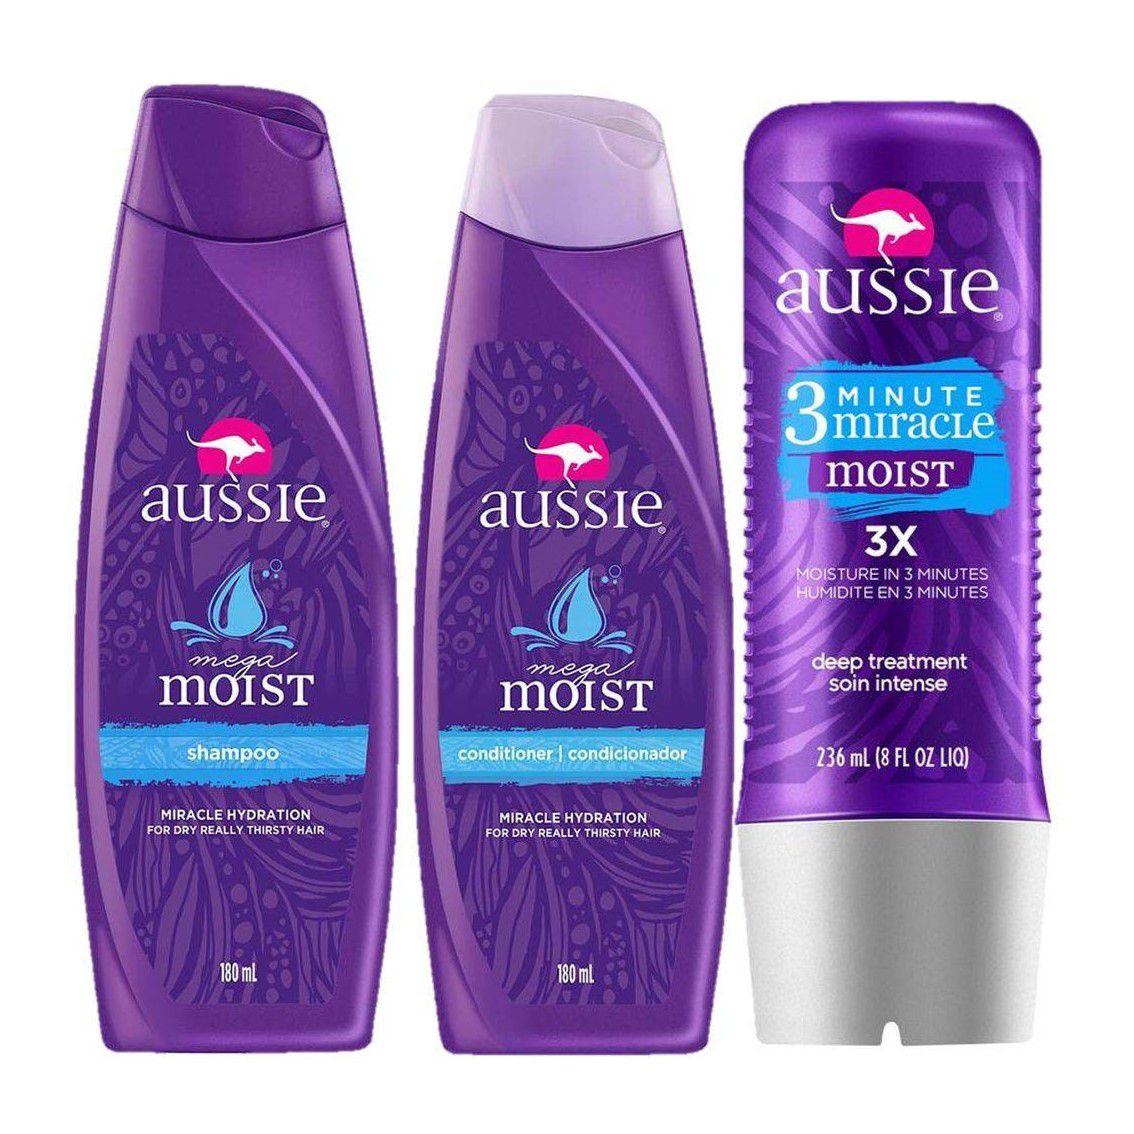 Kit Aussie Moist: Shampoo + Condicionador 180ml + Tratamento 3 Minutos 236ml